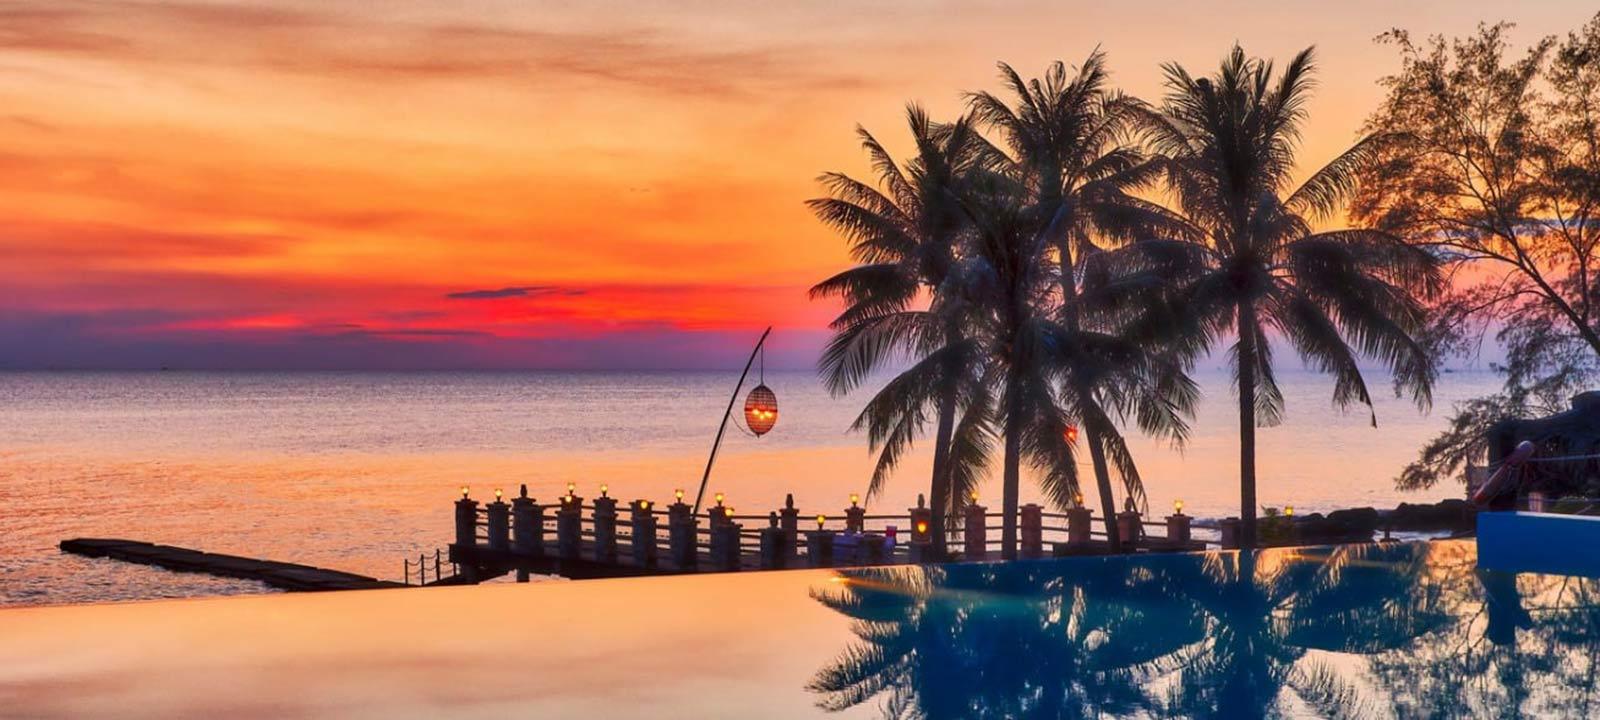 ChenSea Resort and Spa